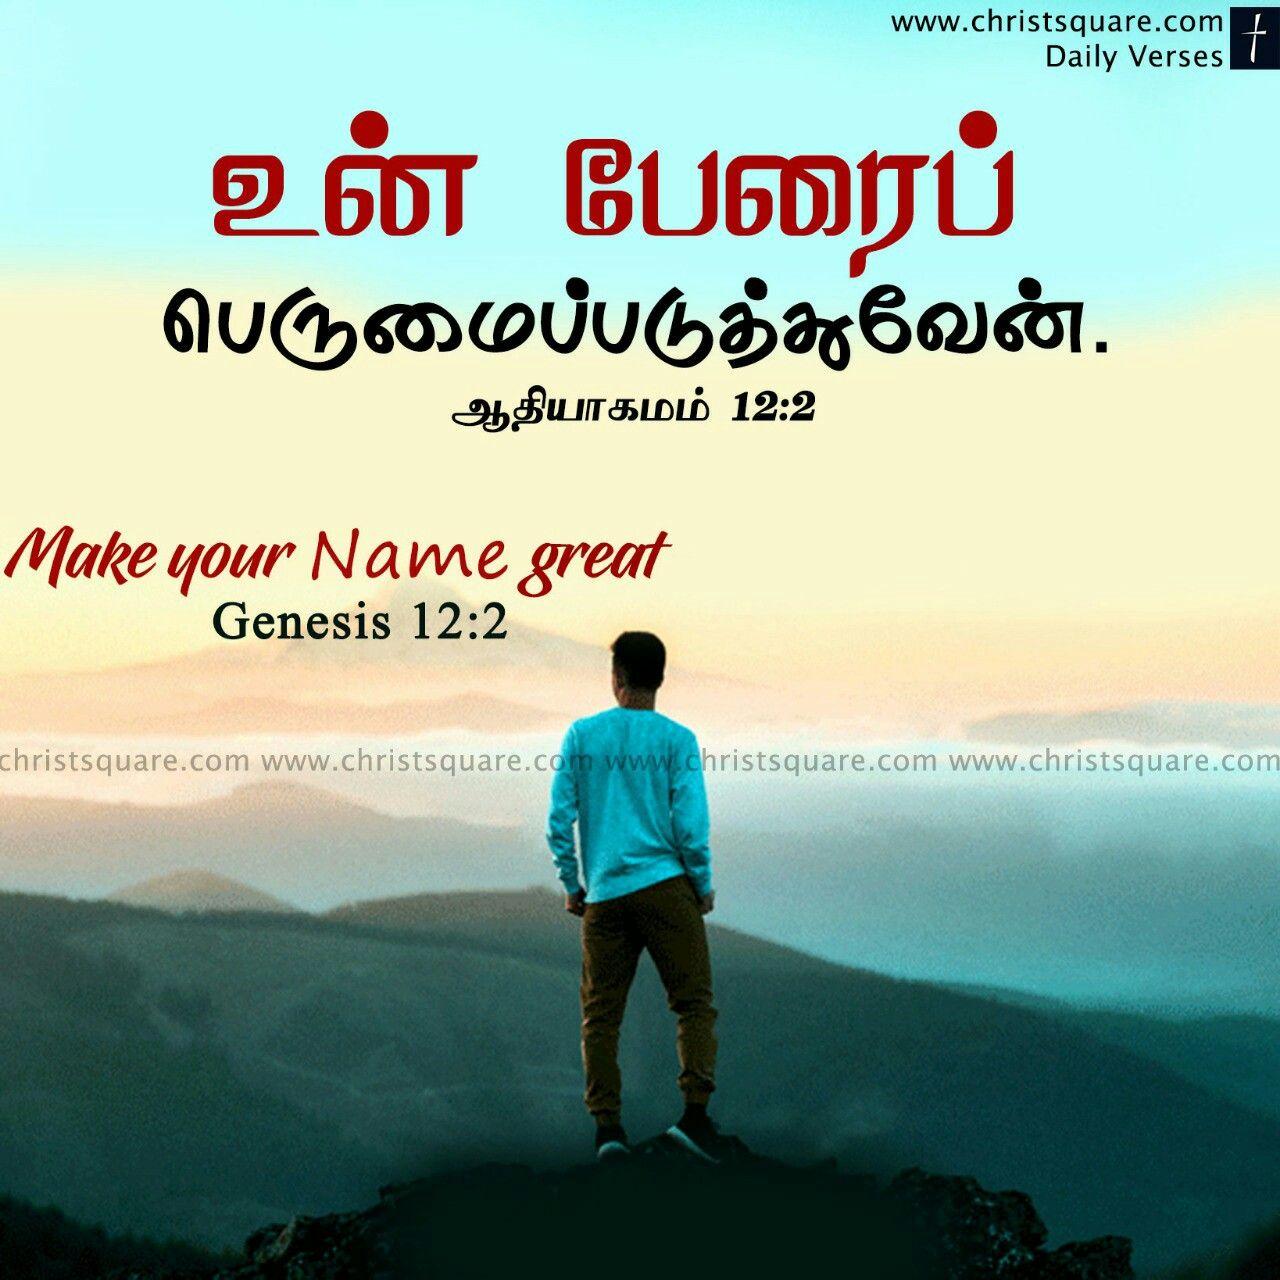 Tamil christian whatsapp status, tamil christian wallpaper